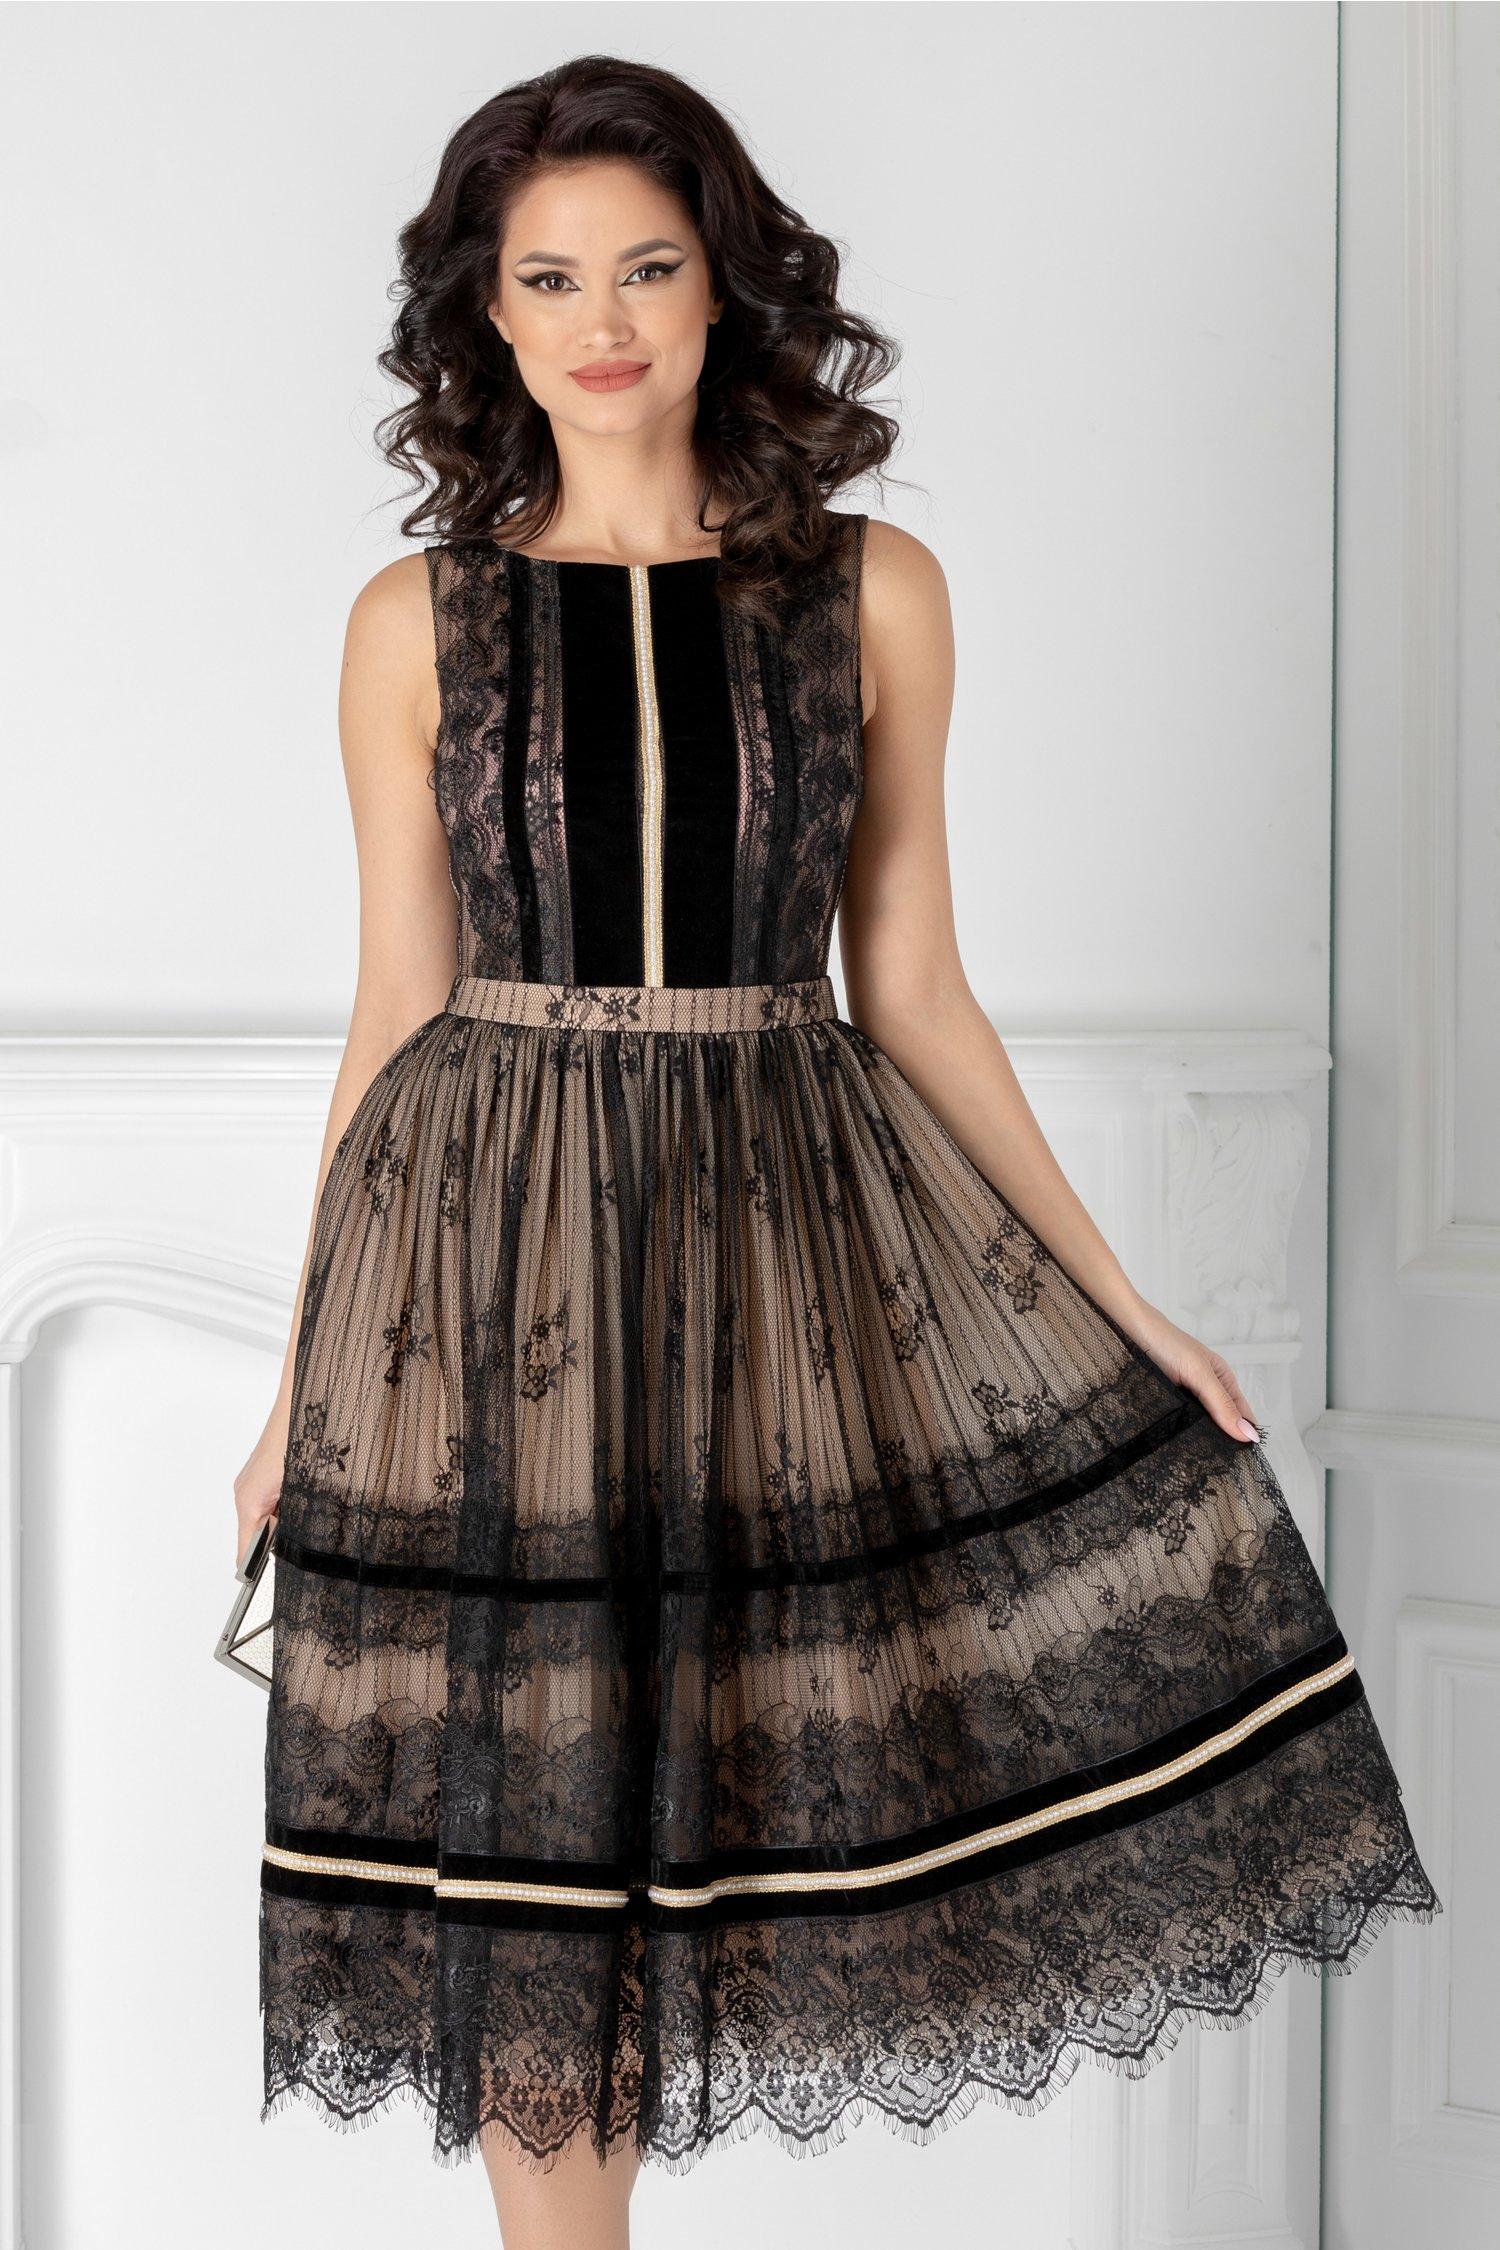 Rochie LaDonna neagra cu dantela chantilly si insertii din catifea negre